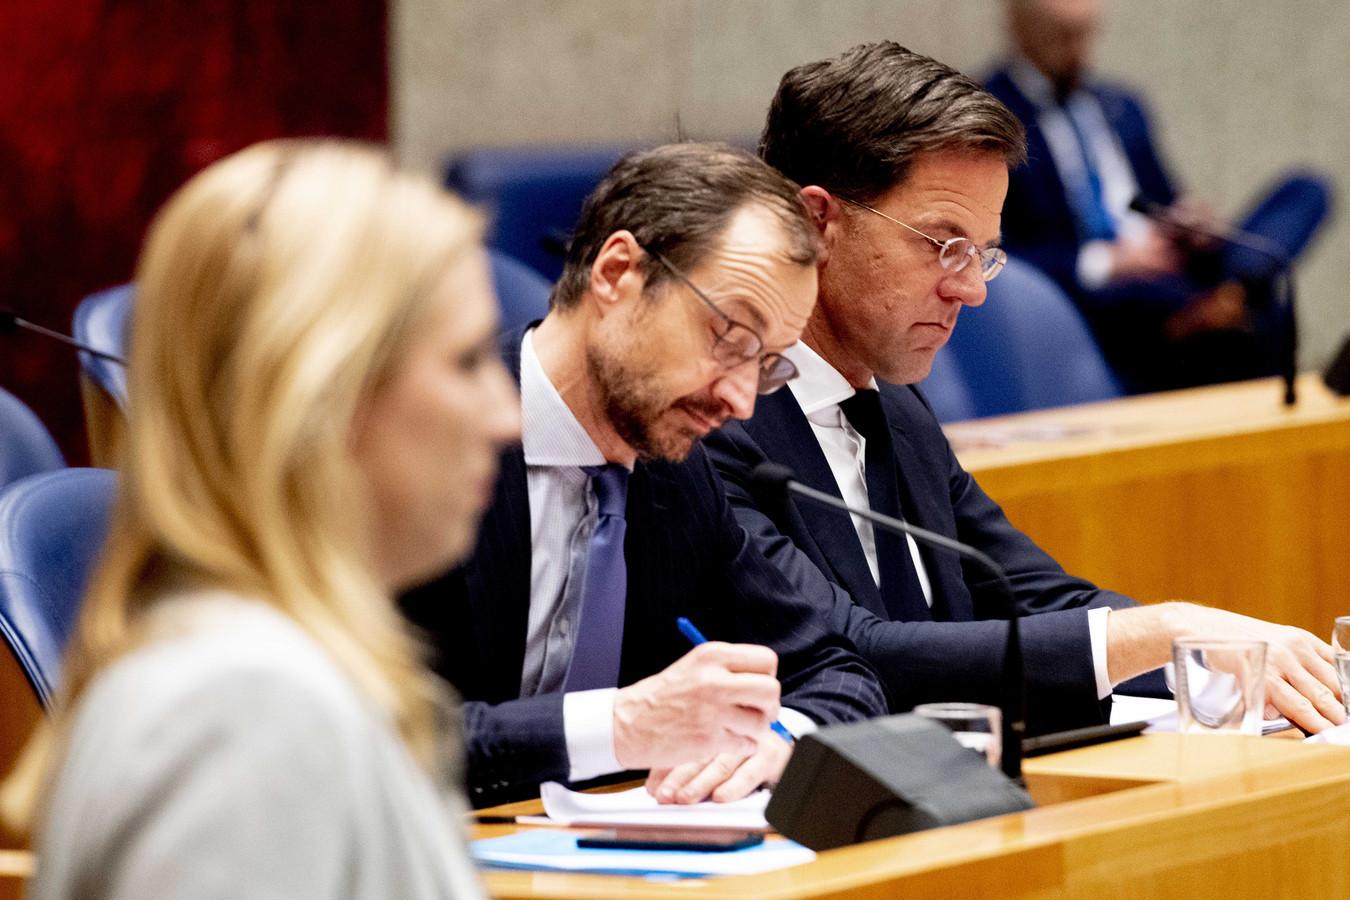 Minister Wiebes en premier Rutte tijdens het debat donderdagavond